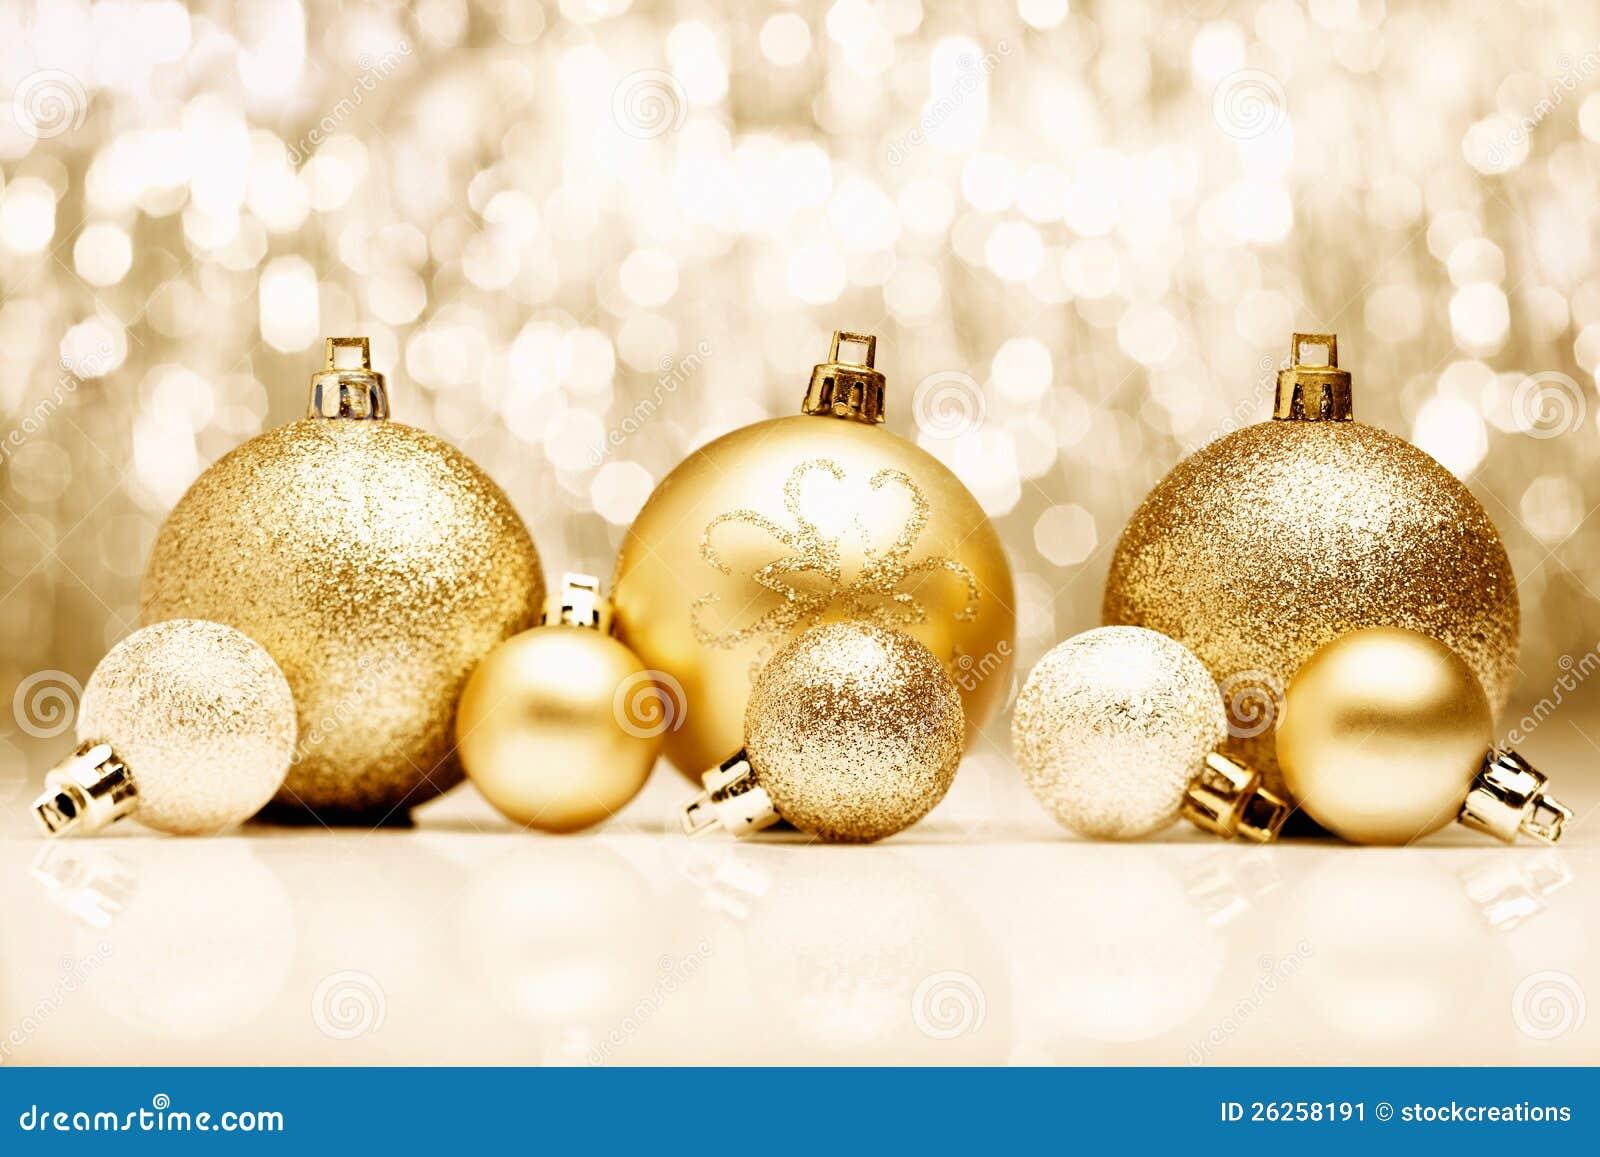 Goldener Weihnachtsflitter